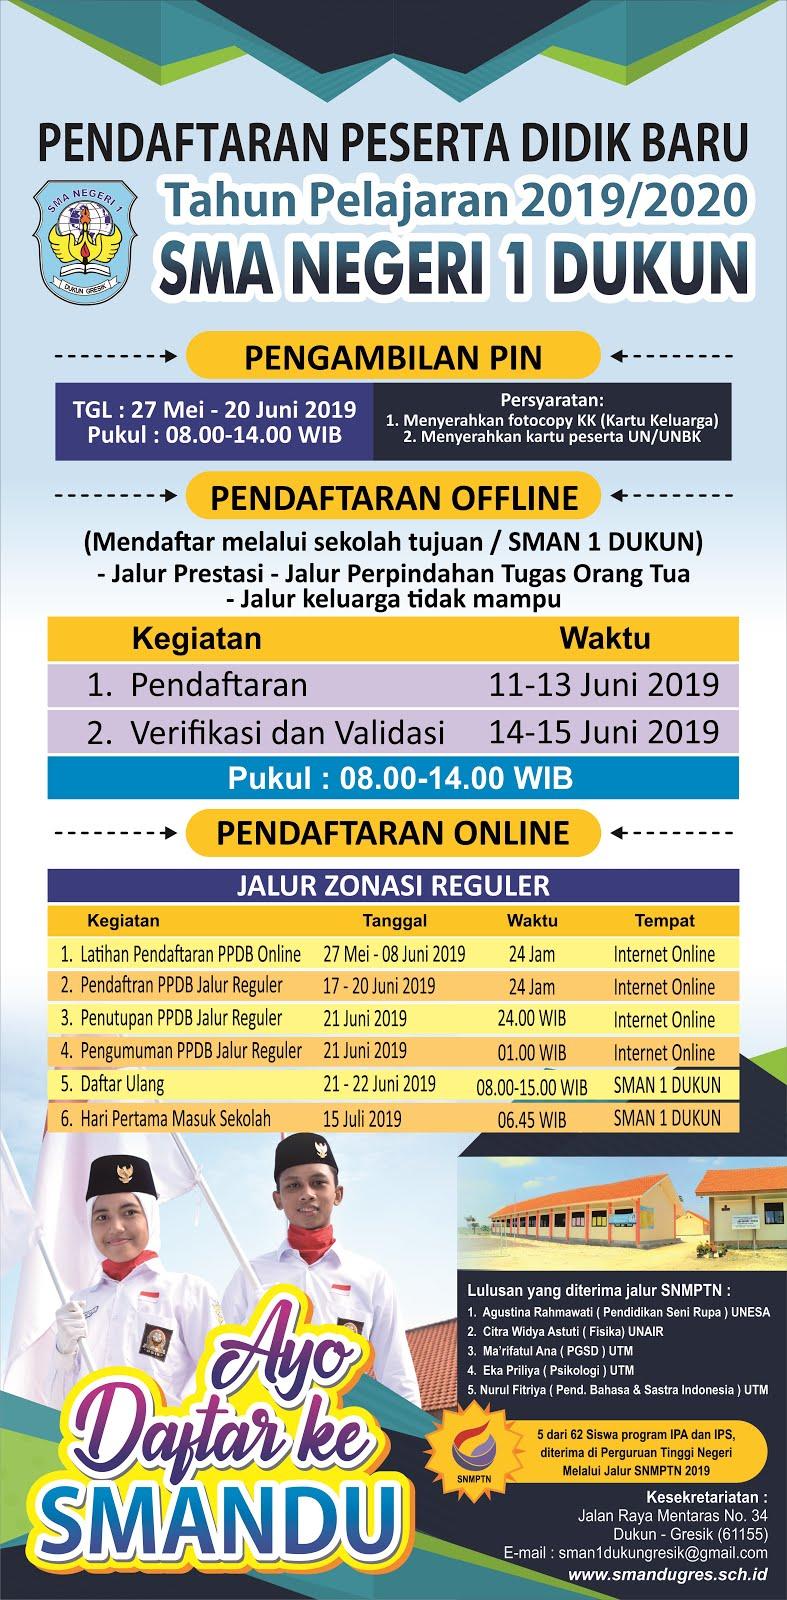 PPDB SMAN 1 DUKUN GRESIK 2019/2020